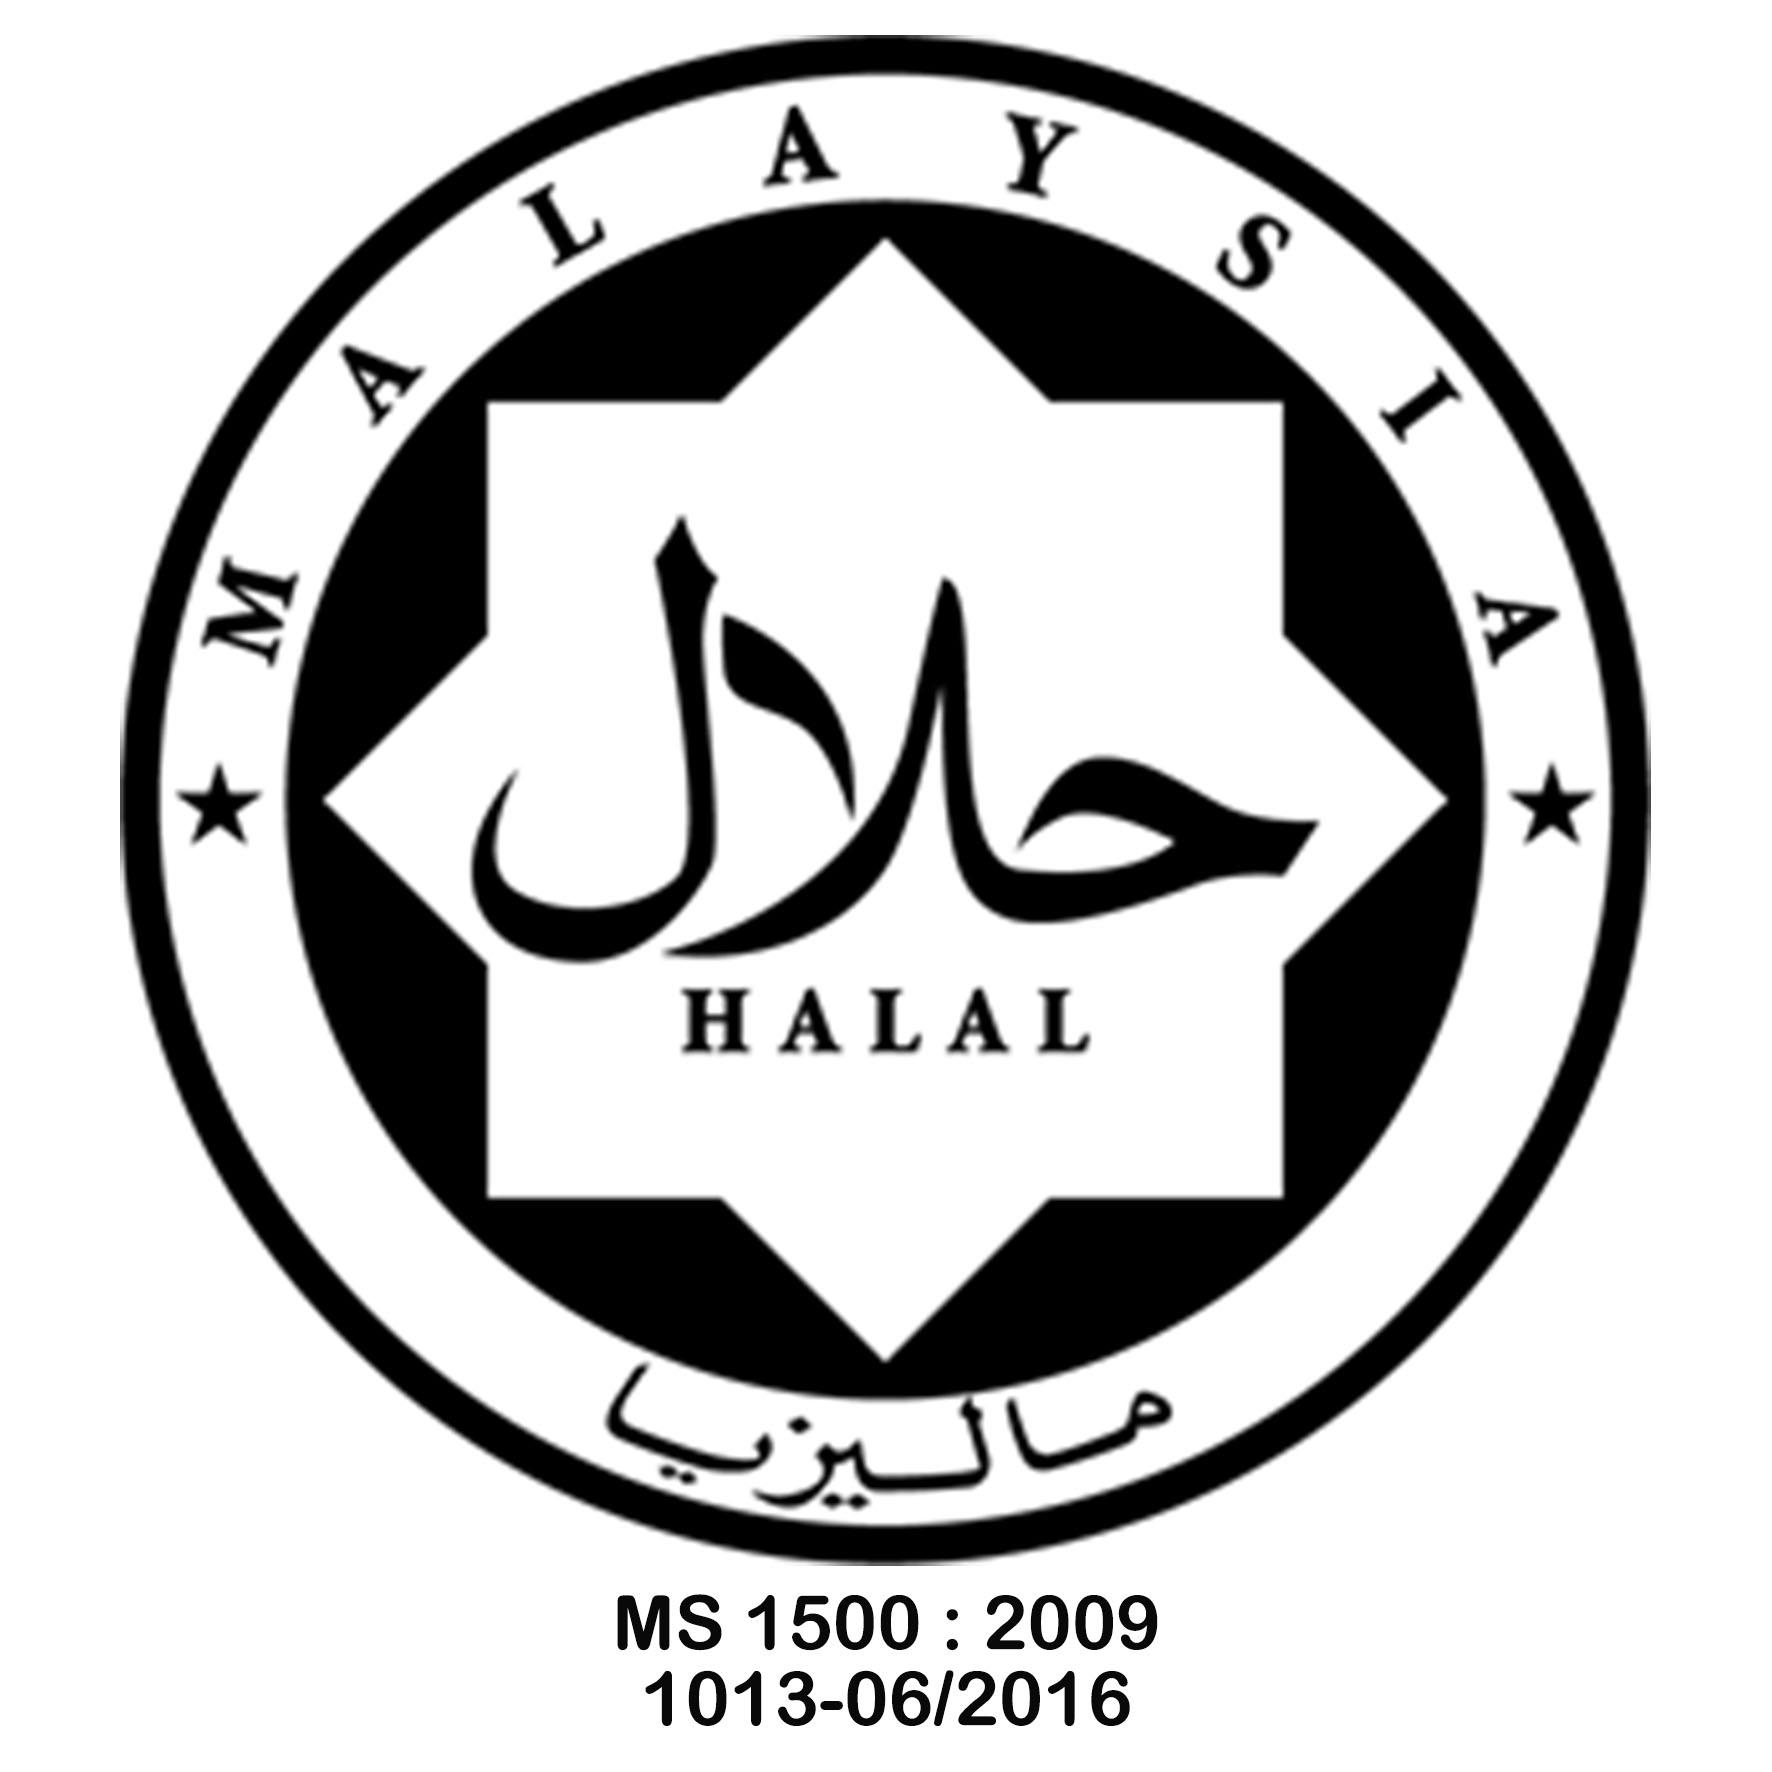 logo HALAL Kenshou